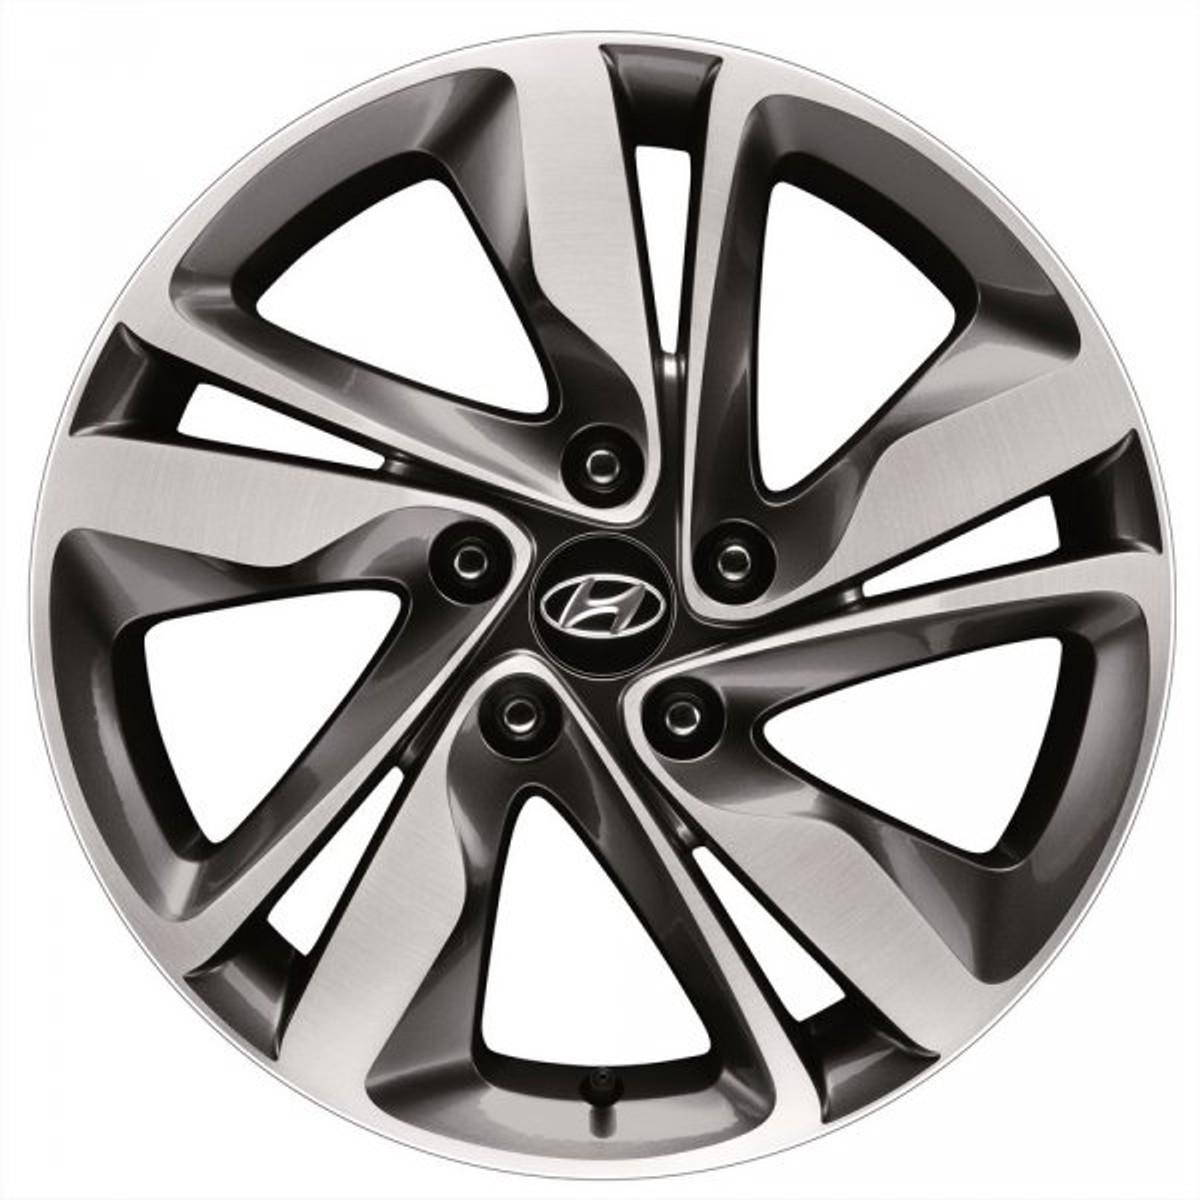 Hyundai Elantra Hatchback 2014: 2014 Hyundai Elantra SA Pricing And Specs